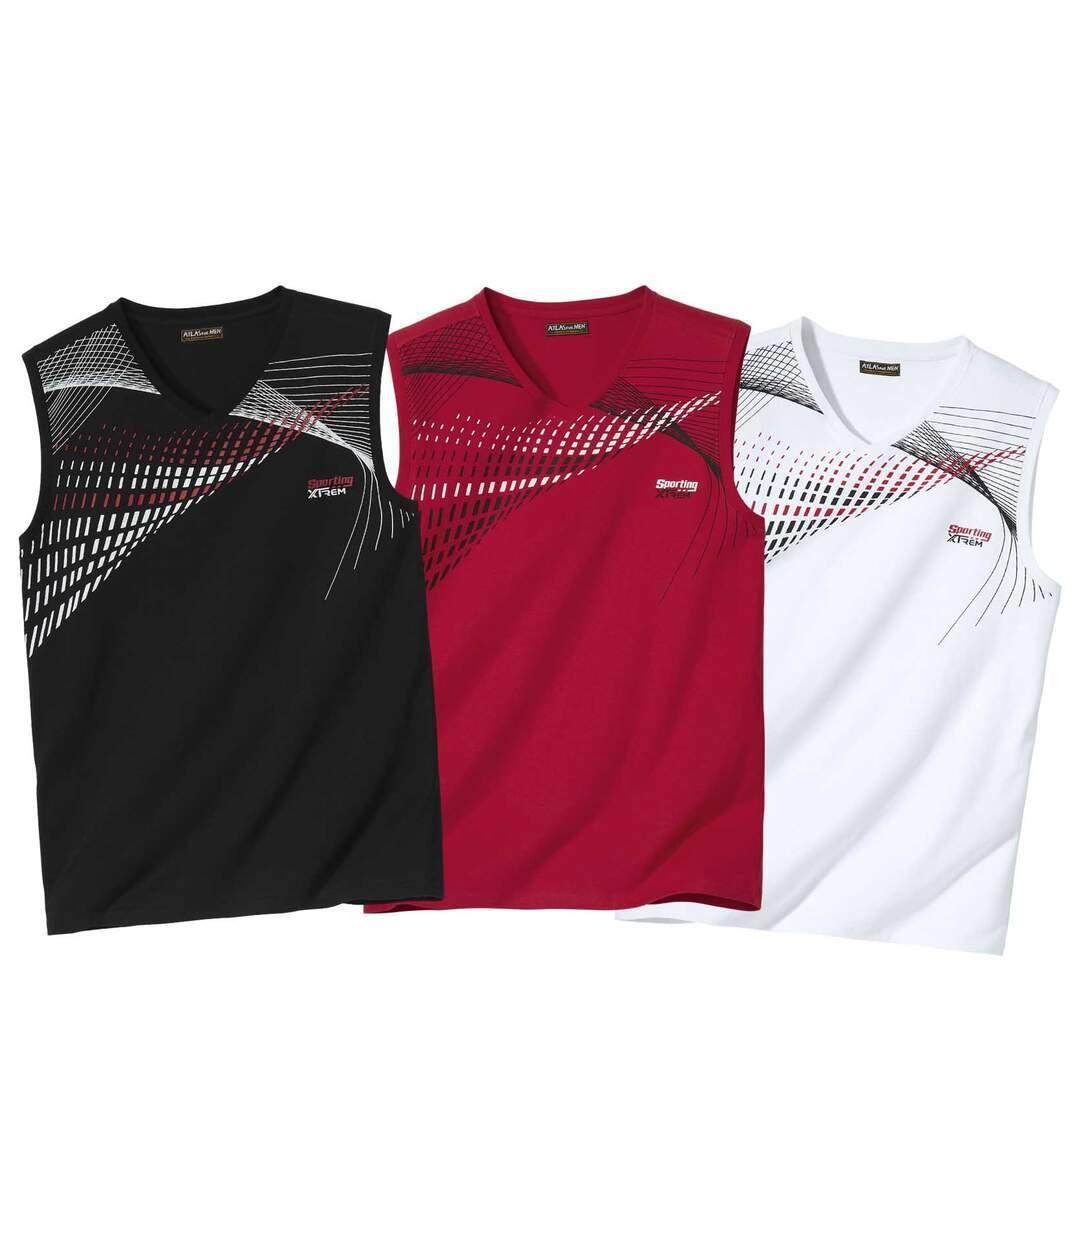 Pack of 3 Men's Sports Vests - Black Red White